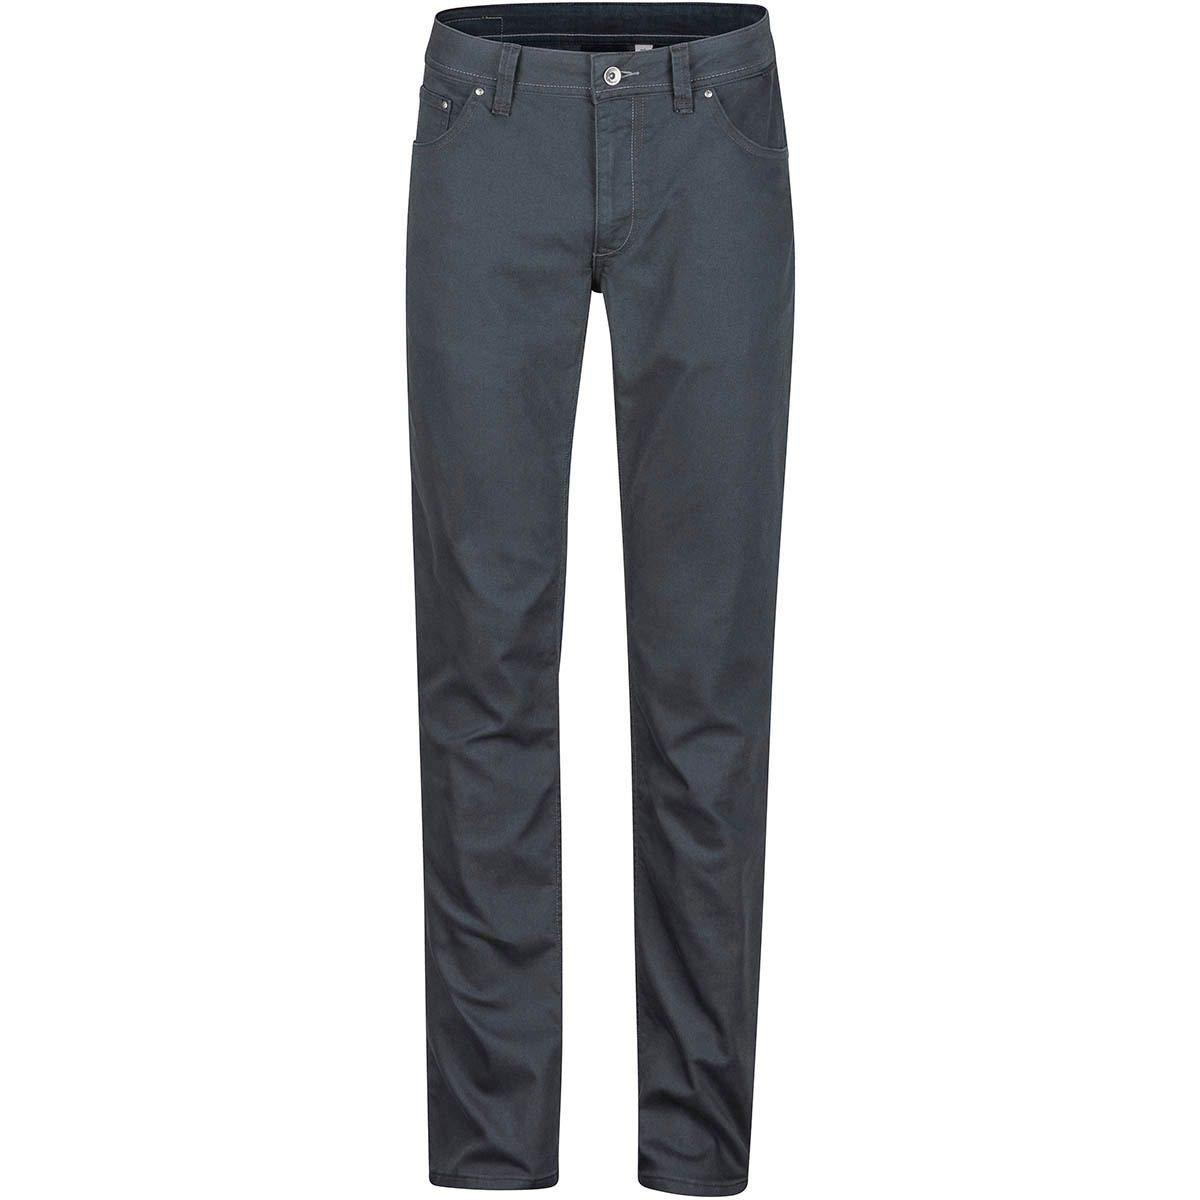 Marmot Mens Morrison Jeans